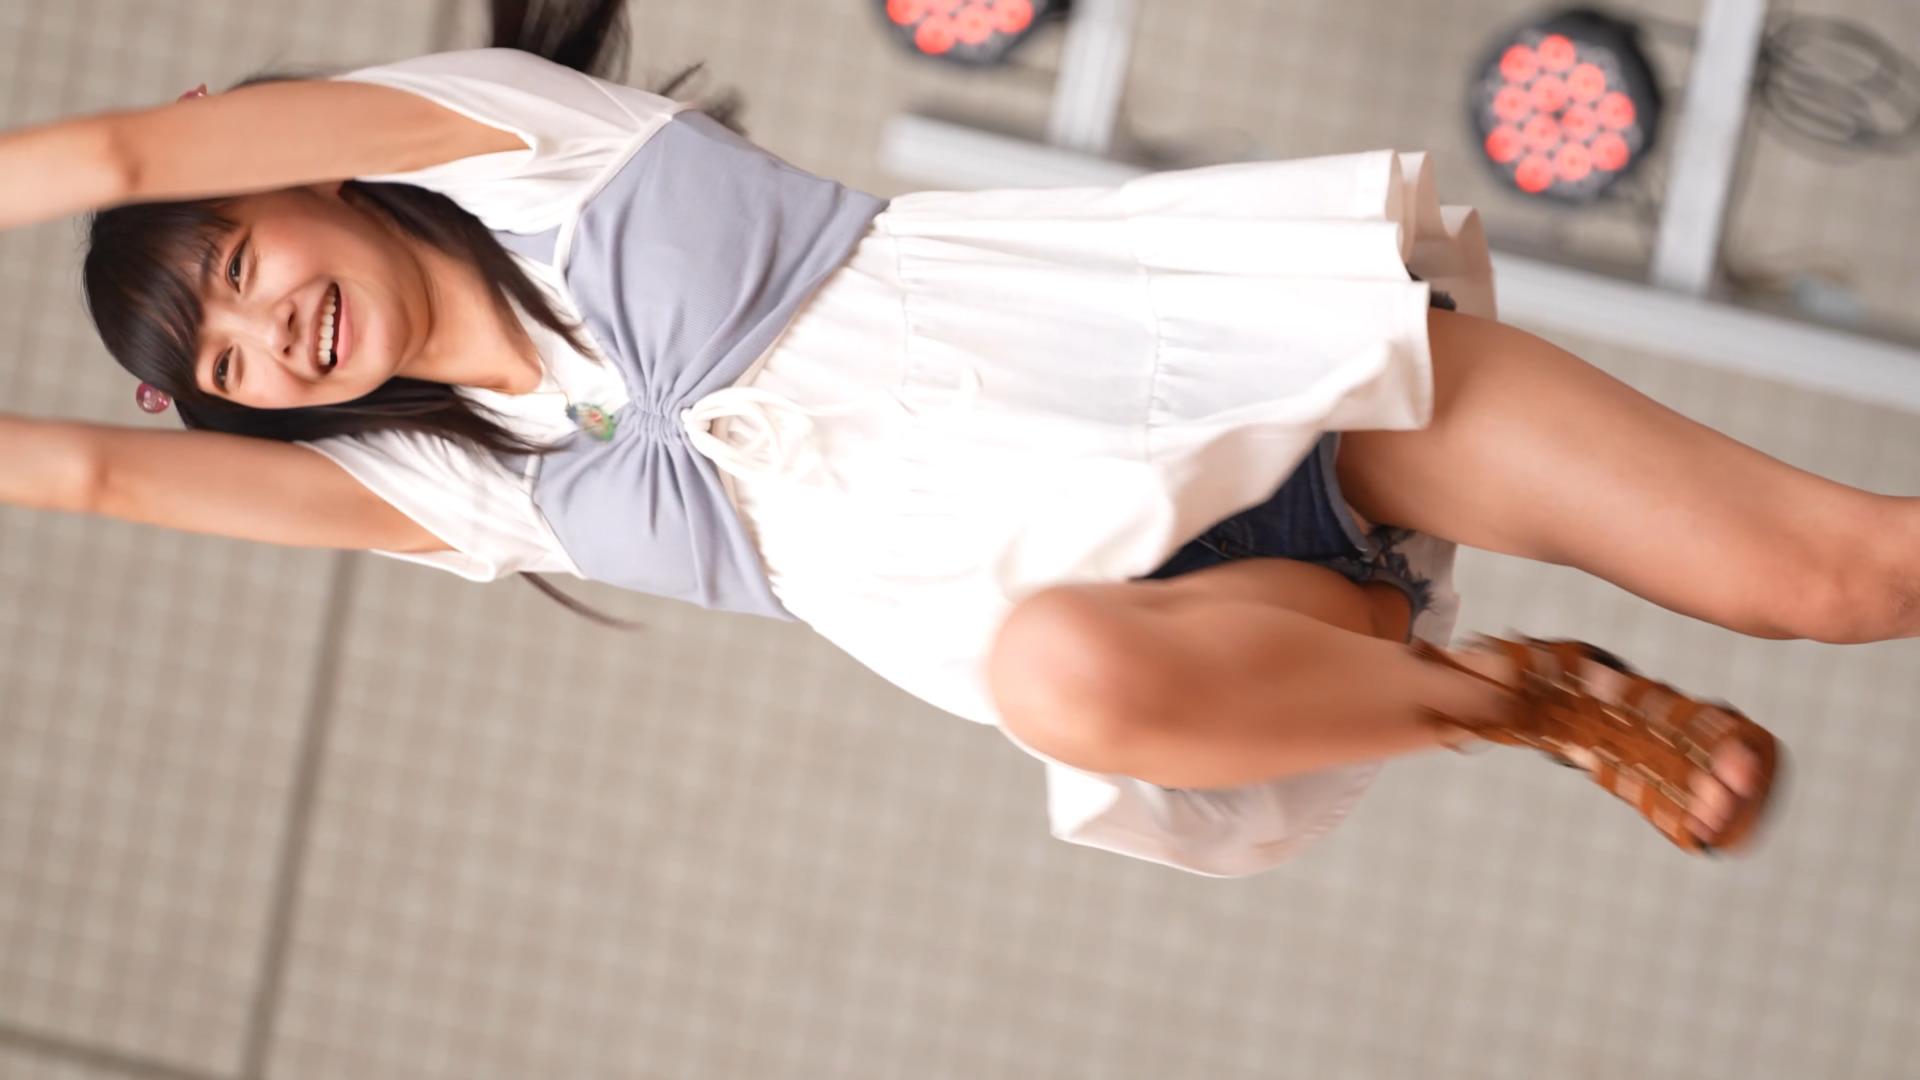 【4K/60P/a7SⅢ】松山あおい アイドルステーションvol.4~女神達と梅雨を吹き飛ばせ!②~稲毛海岸野外音楽堂 2021/06/20 05:18